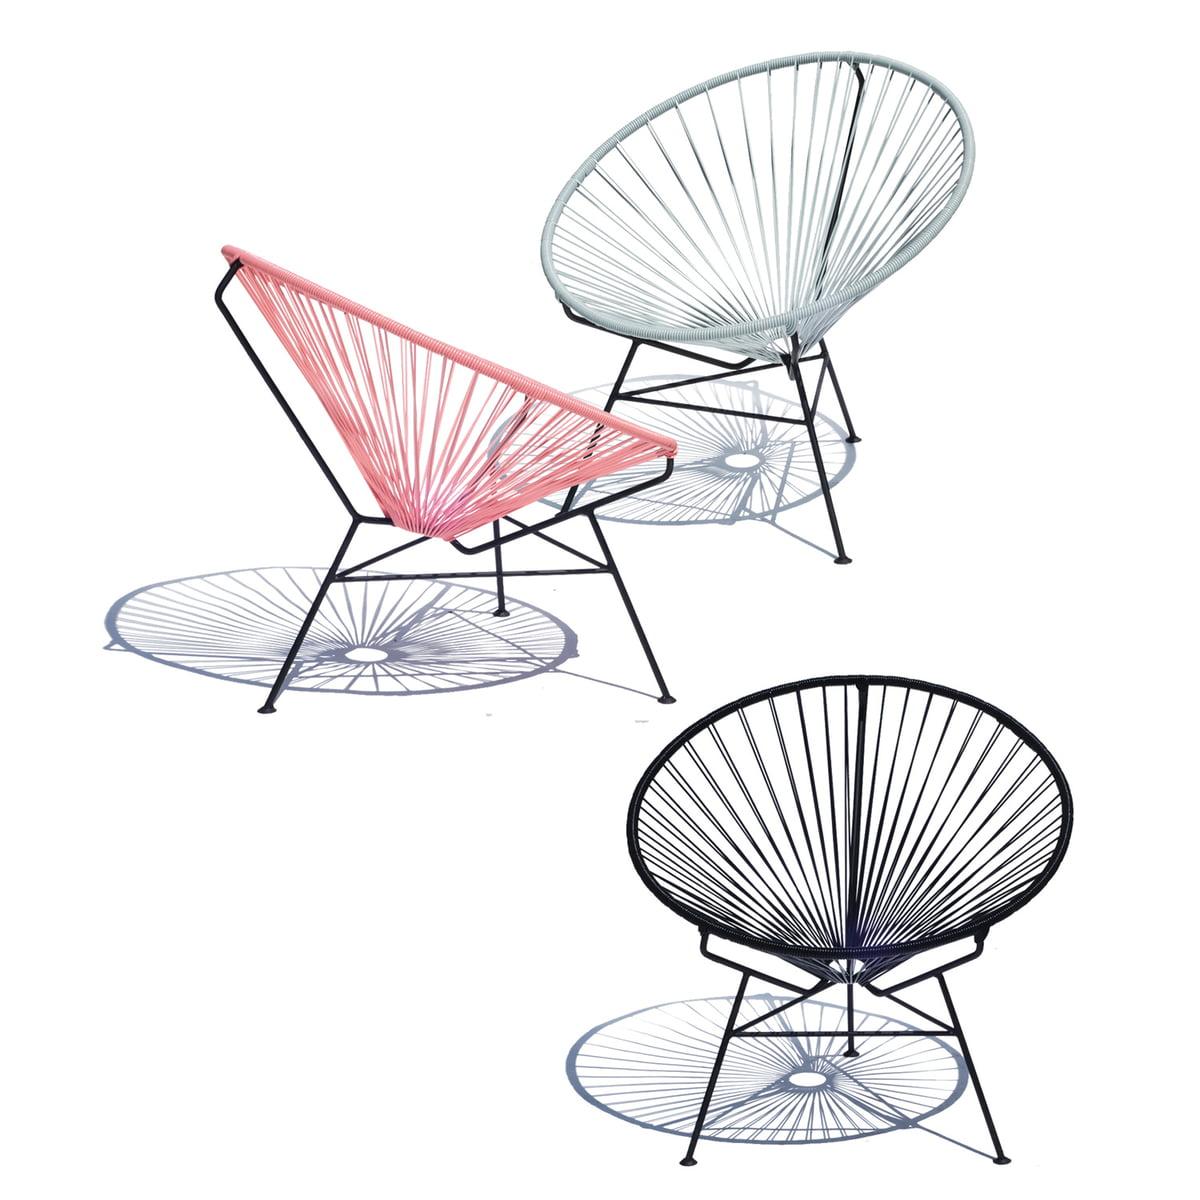 Connox Wohndesign: OK Design Condesa Chair Im Wohndesign-Shop